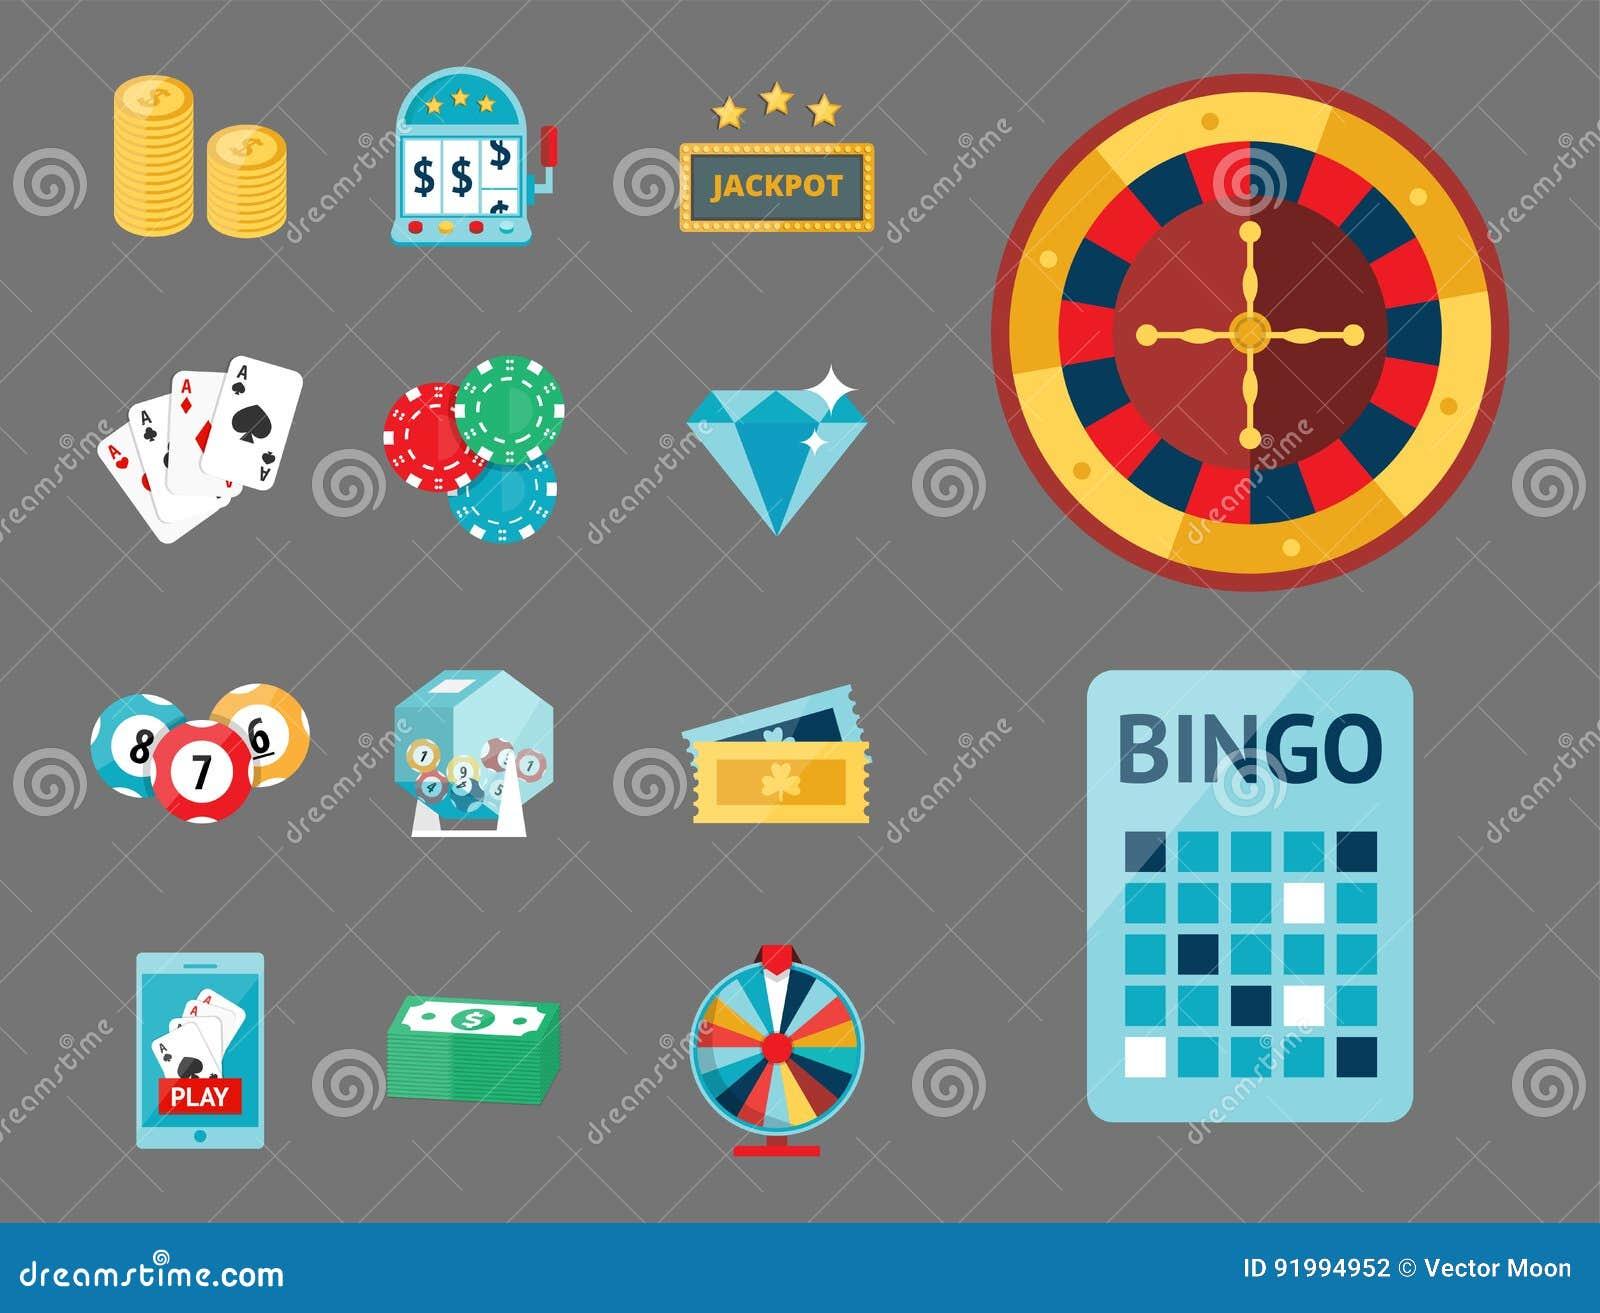 Latest news online gambling usa